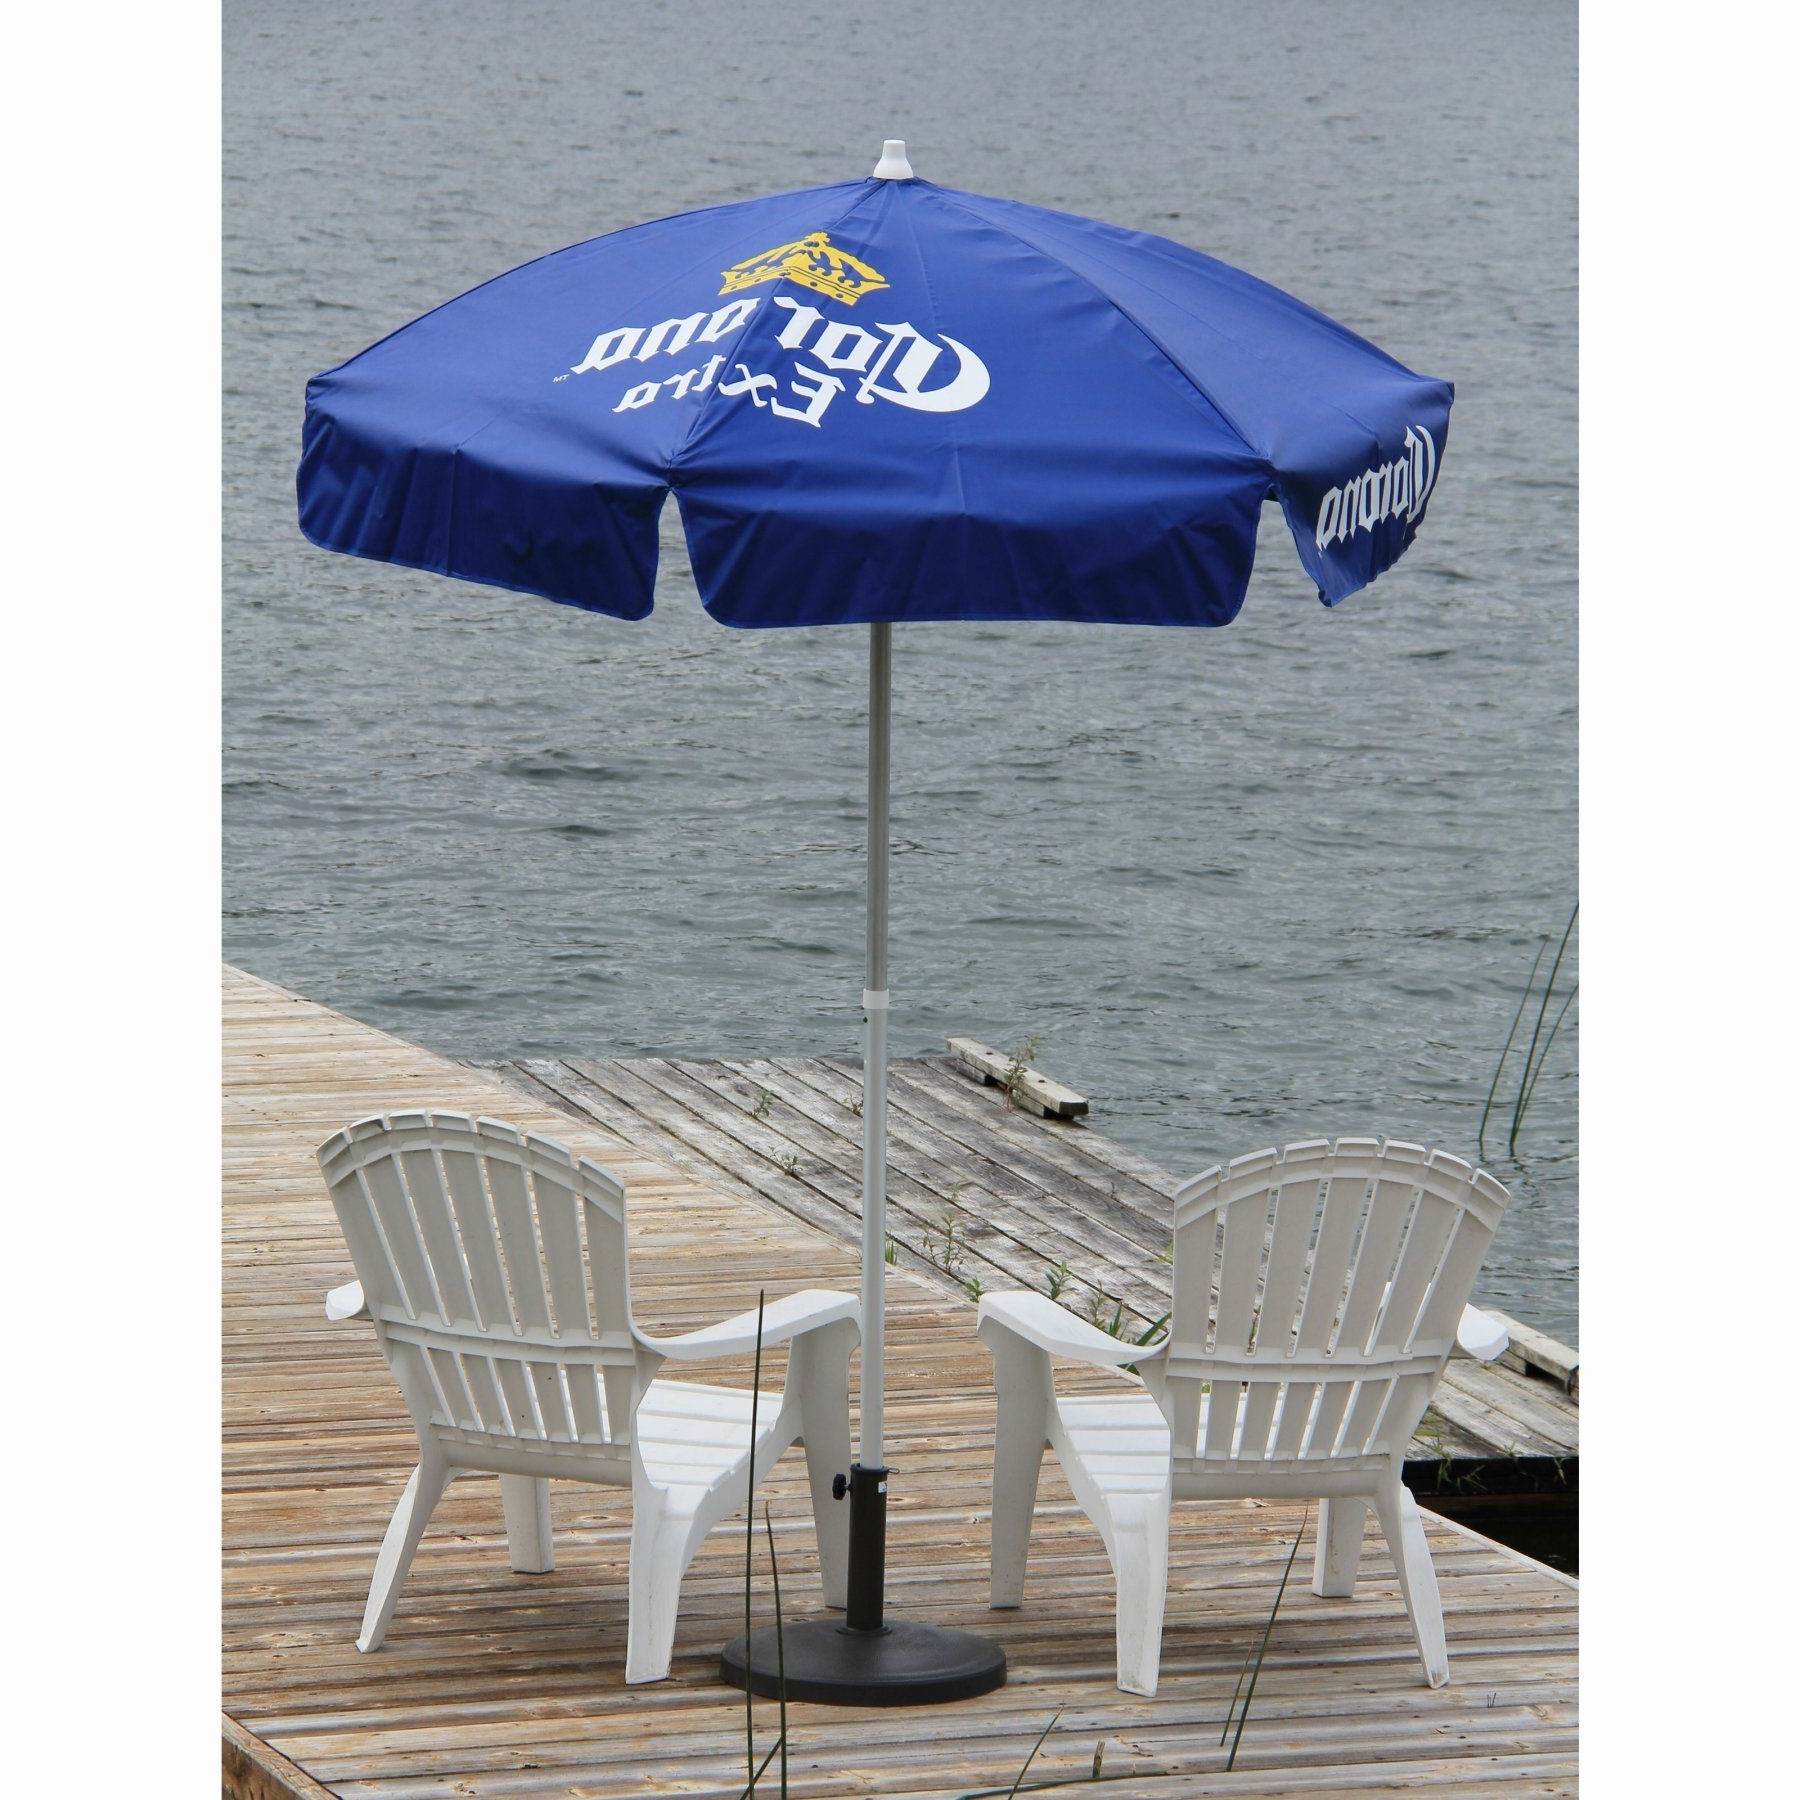 Vinyl Patio Umbrellas Intended For Favorite Destinationgear Corona Extra Vinyl Patio Umbrella – (View 17 of 20)